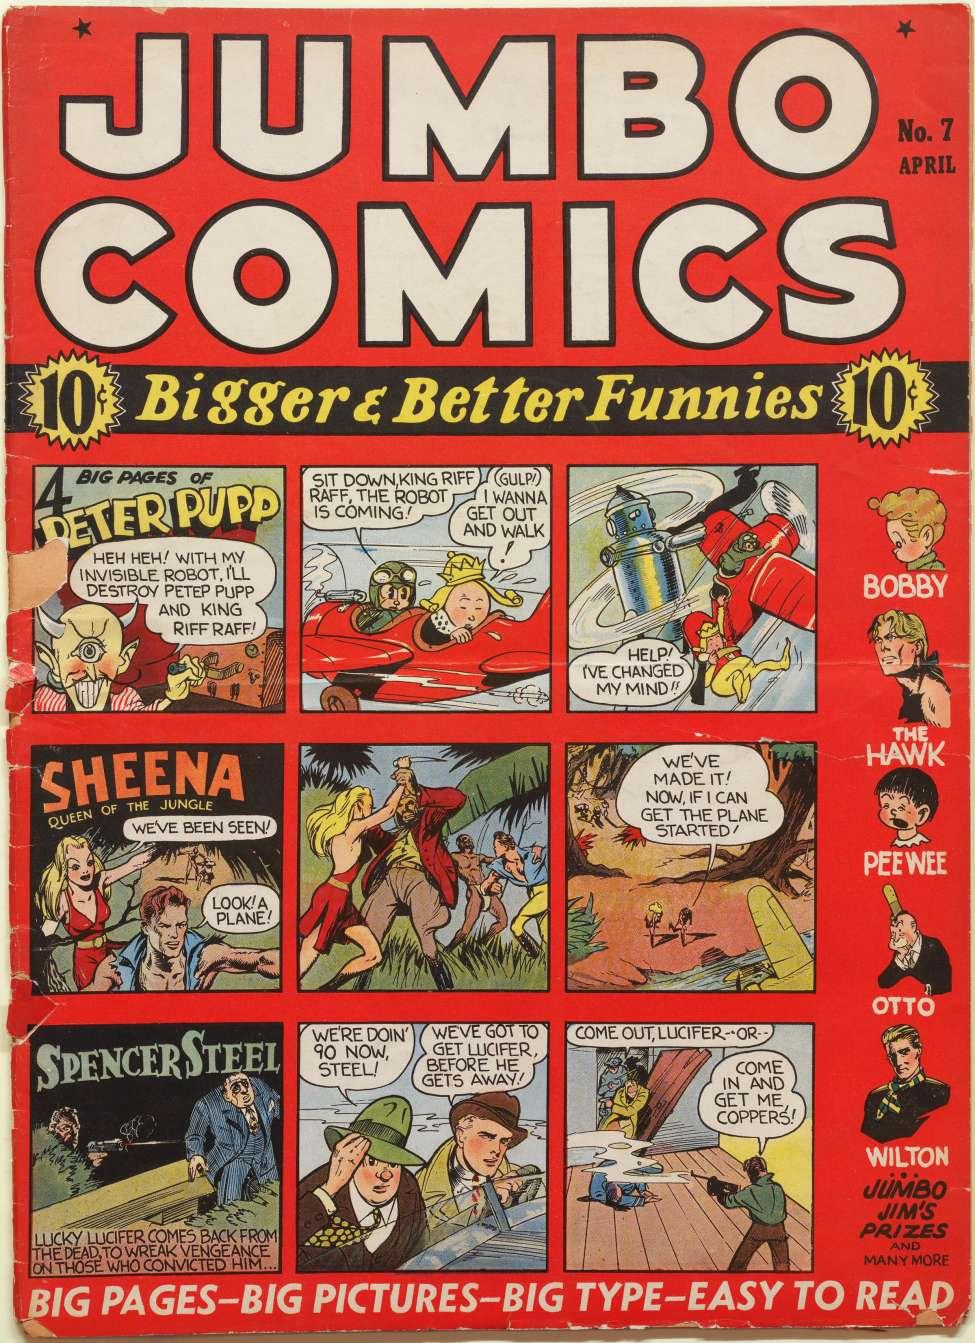 Comic Book Cover For Jumbo Comics #7